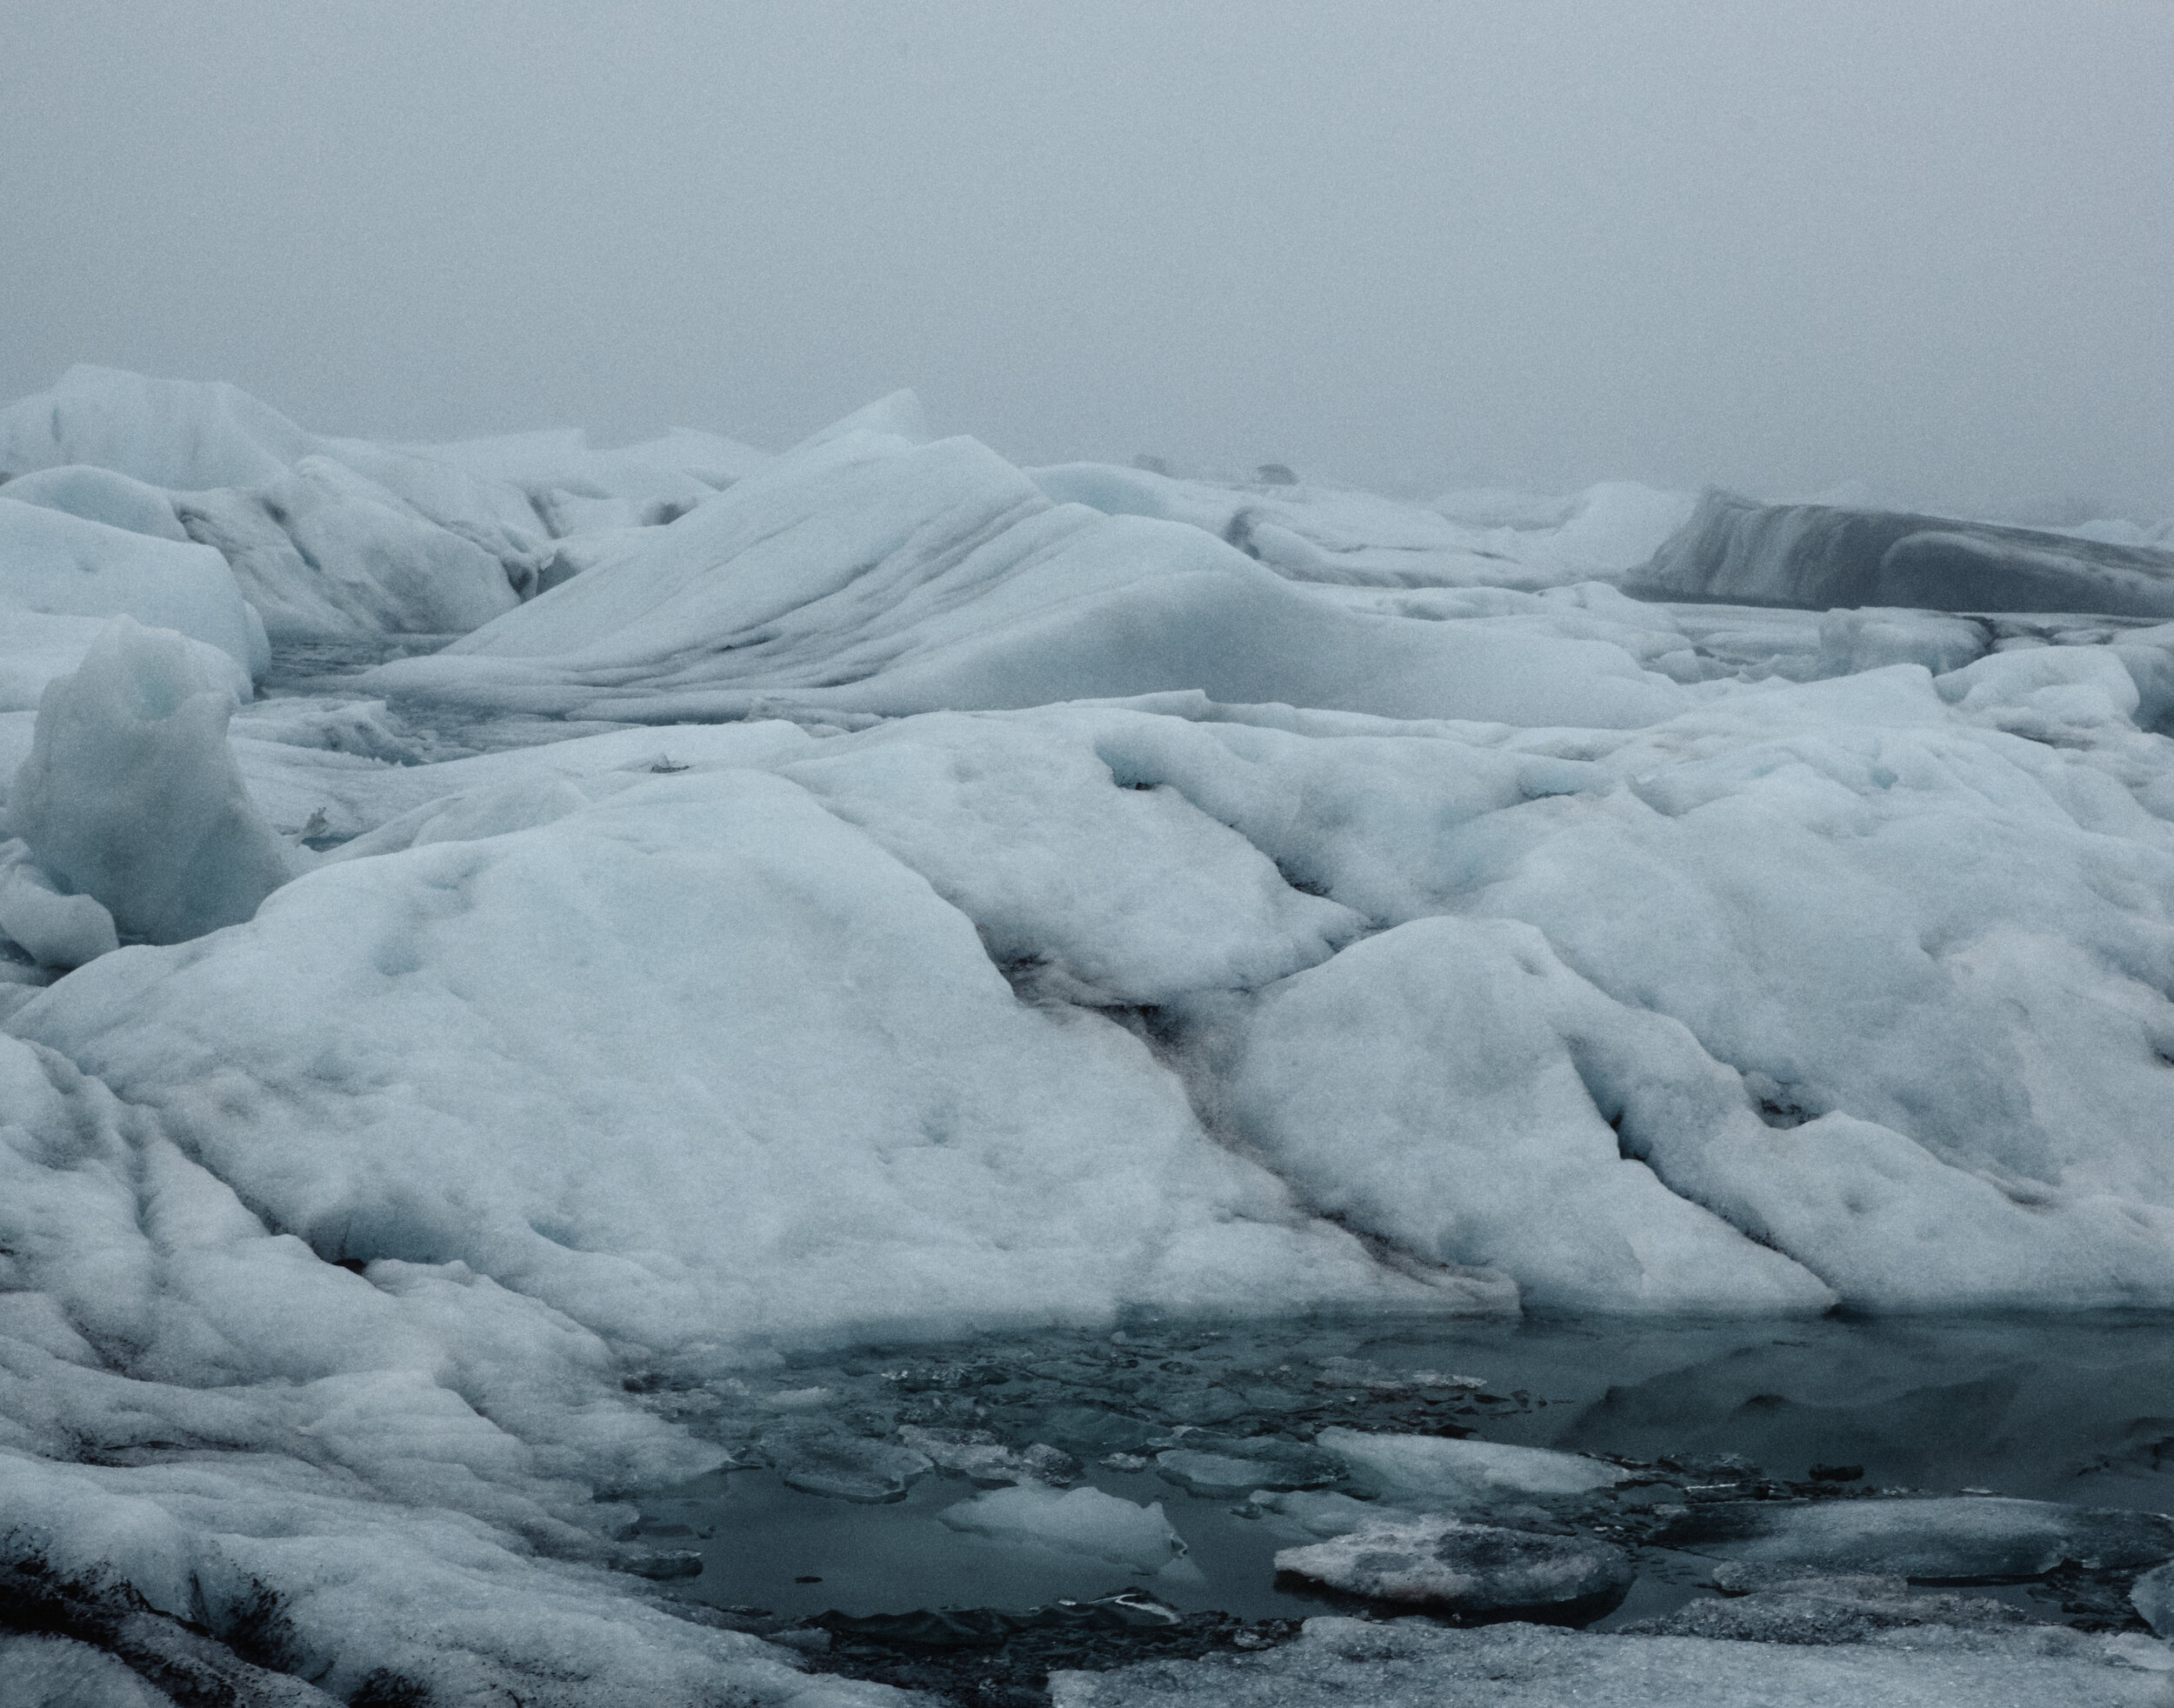 1103.Iceland.JKim1226.jpg